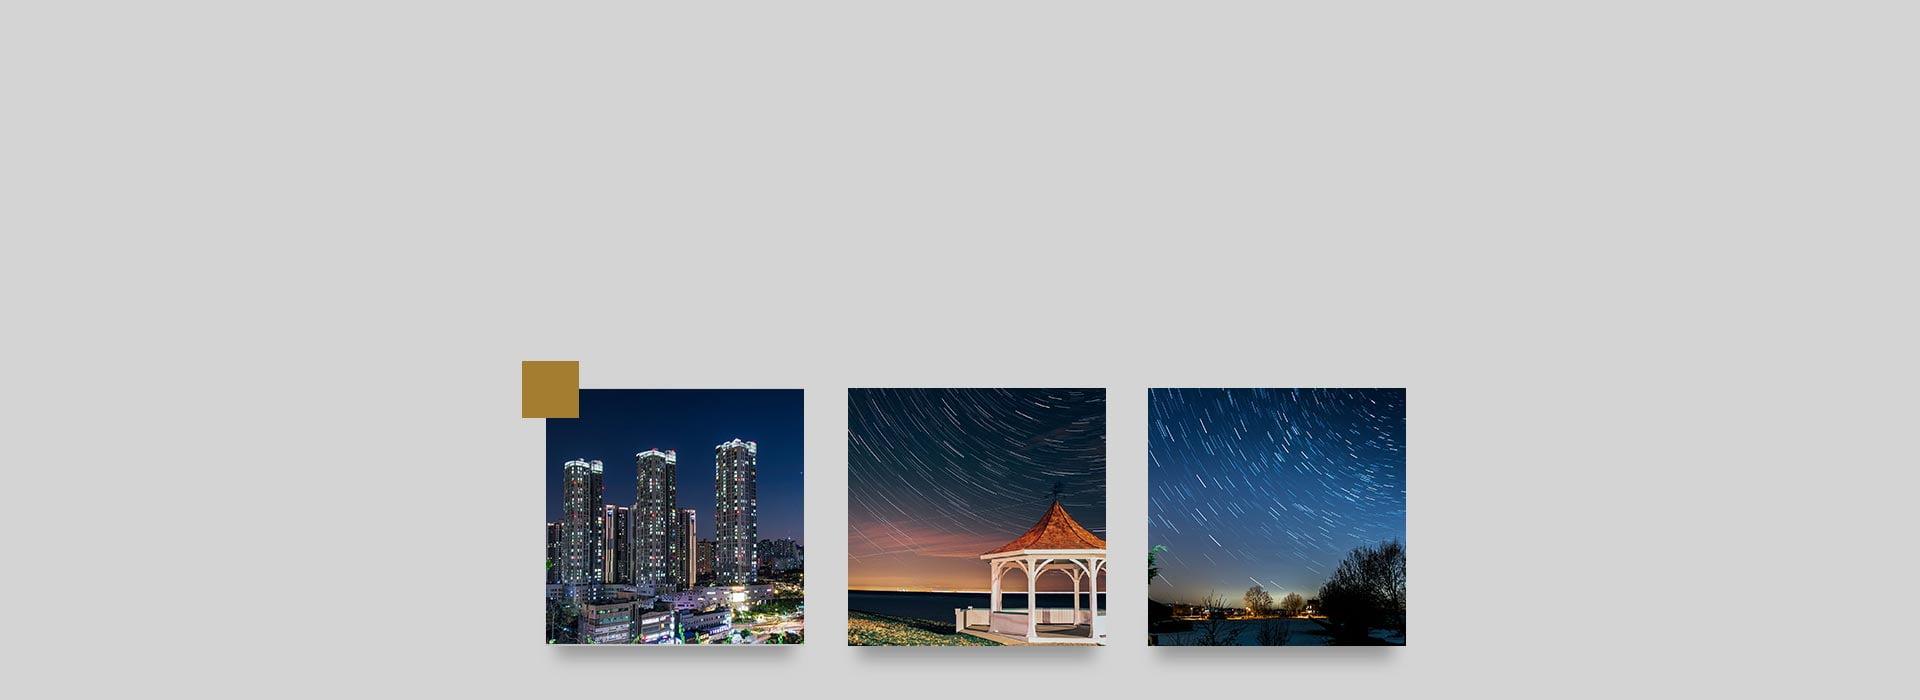 night photography Introduction - عکاسی در شب